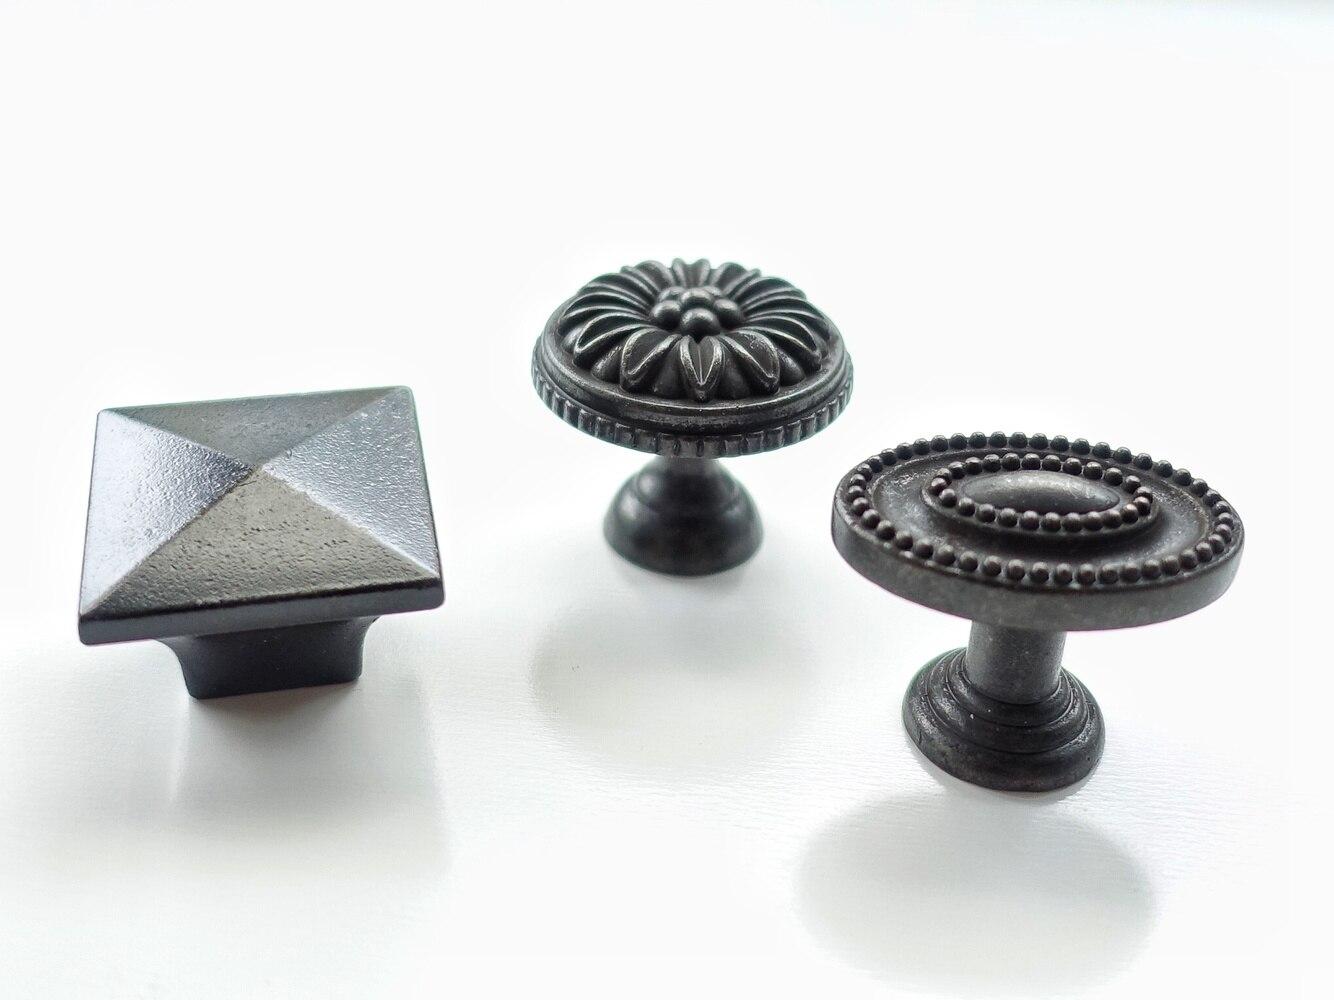 Knoppen Voor Kast : Kopen goedkoop zwarte antieke vintage kast knop lade deur handgrepen